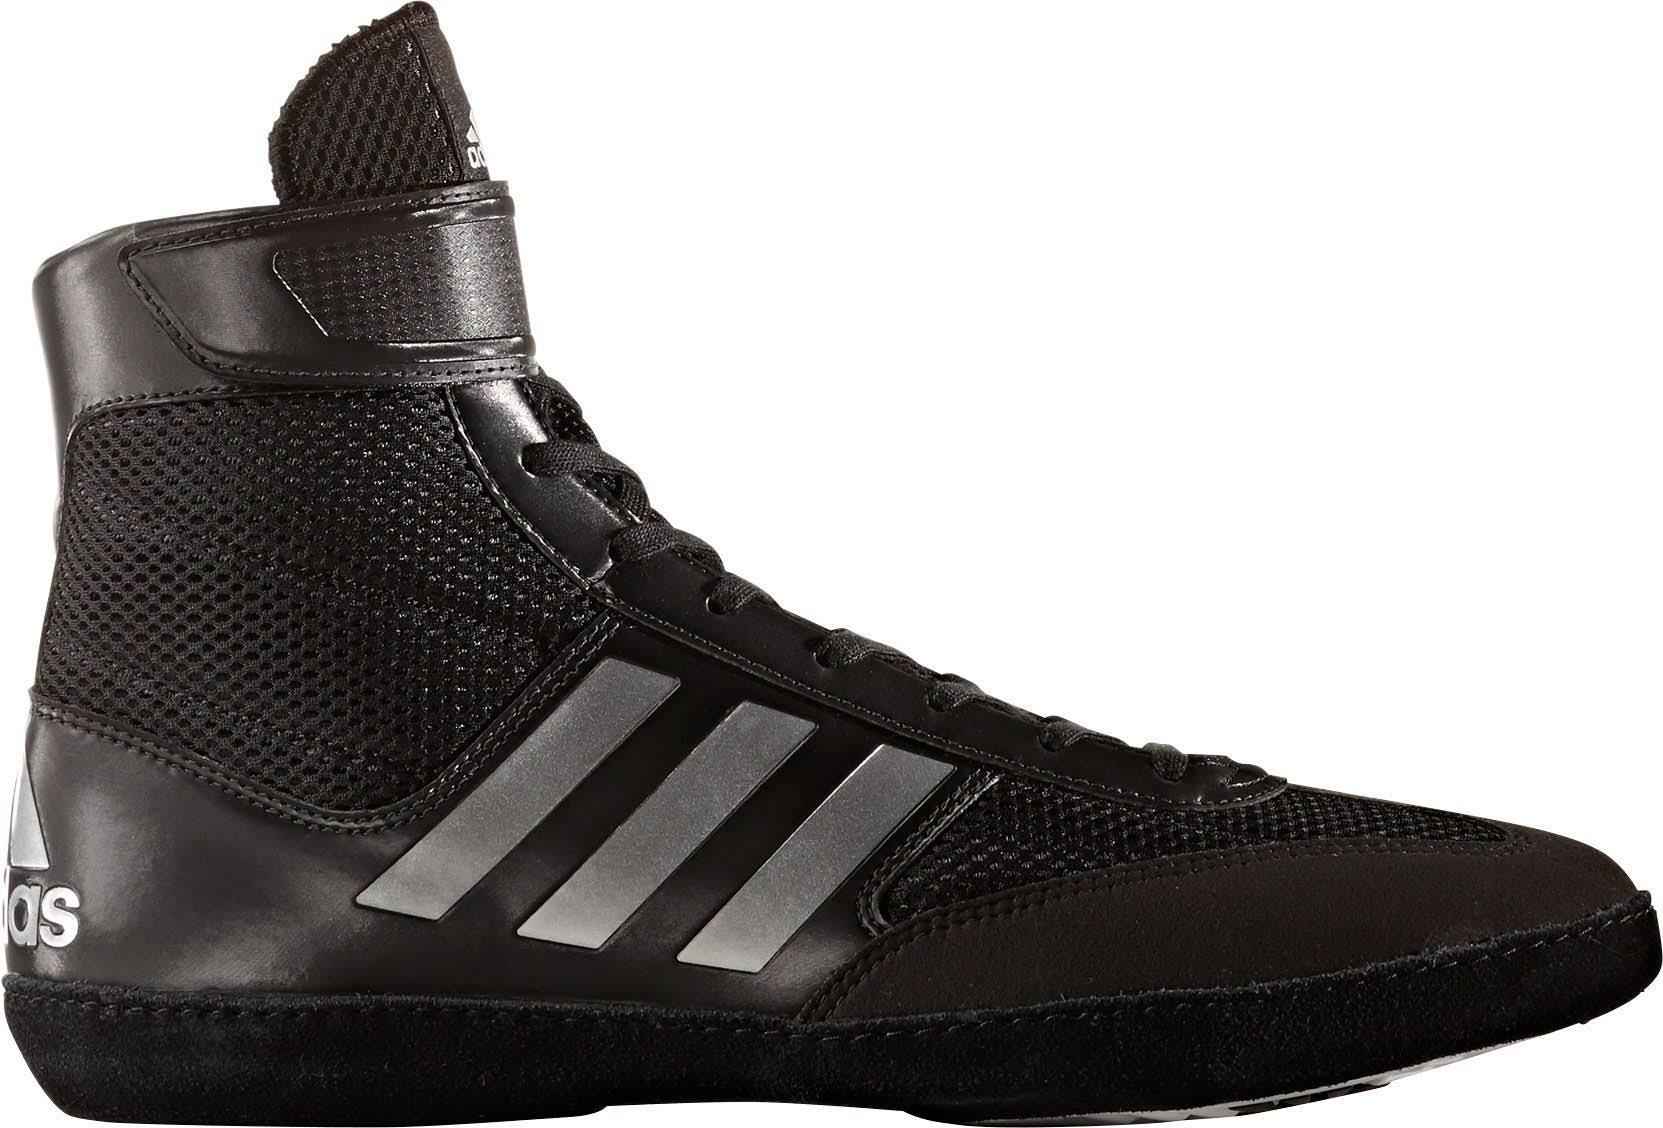 Adidas Combat Silber Speed 5 Schwarz Ba8007 rfwrOqpz